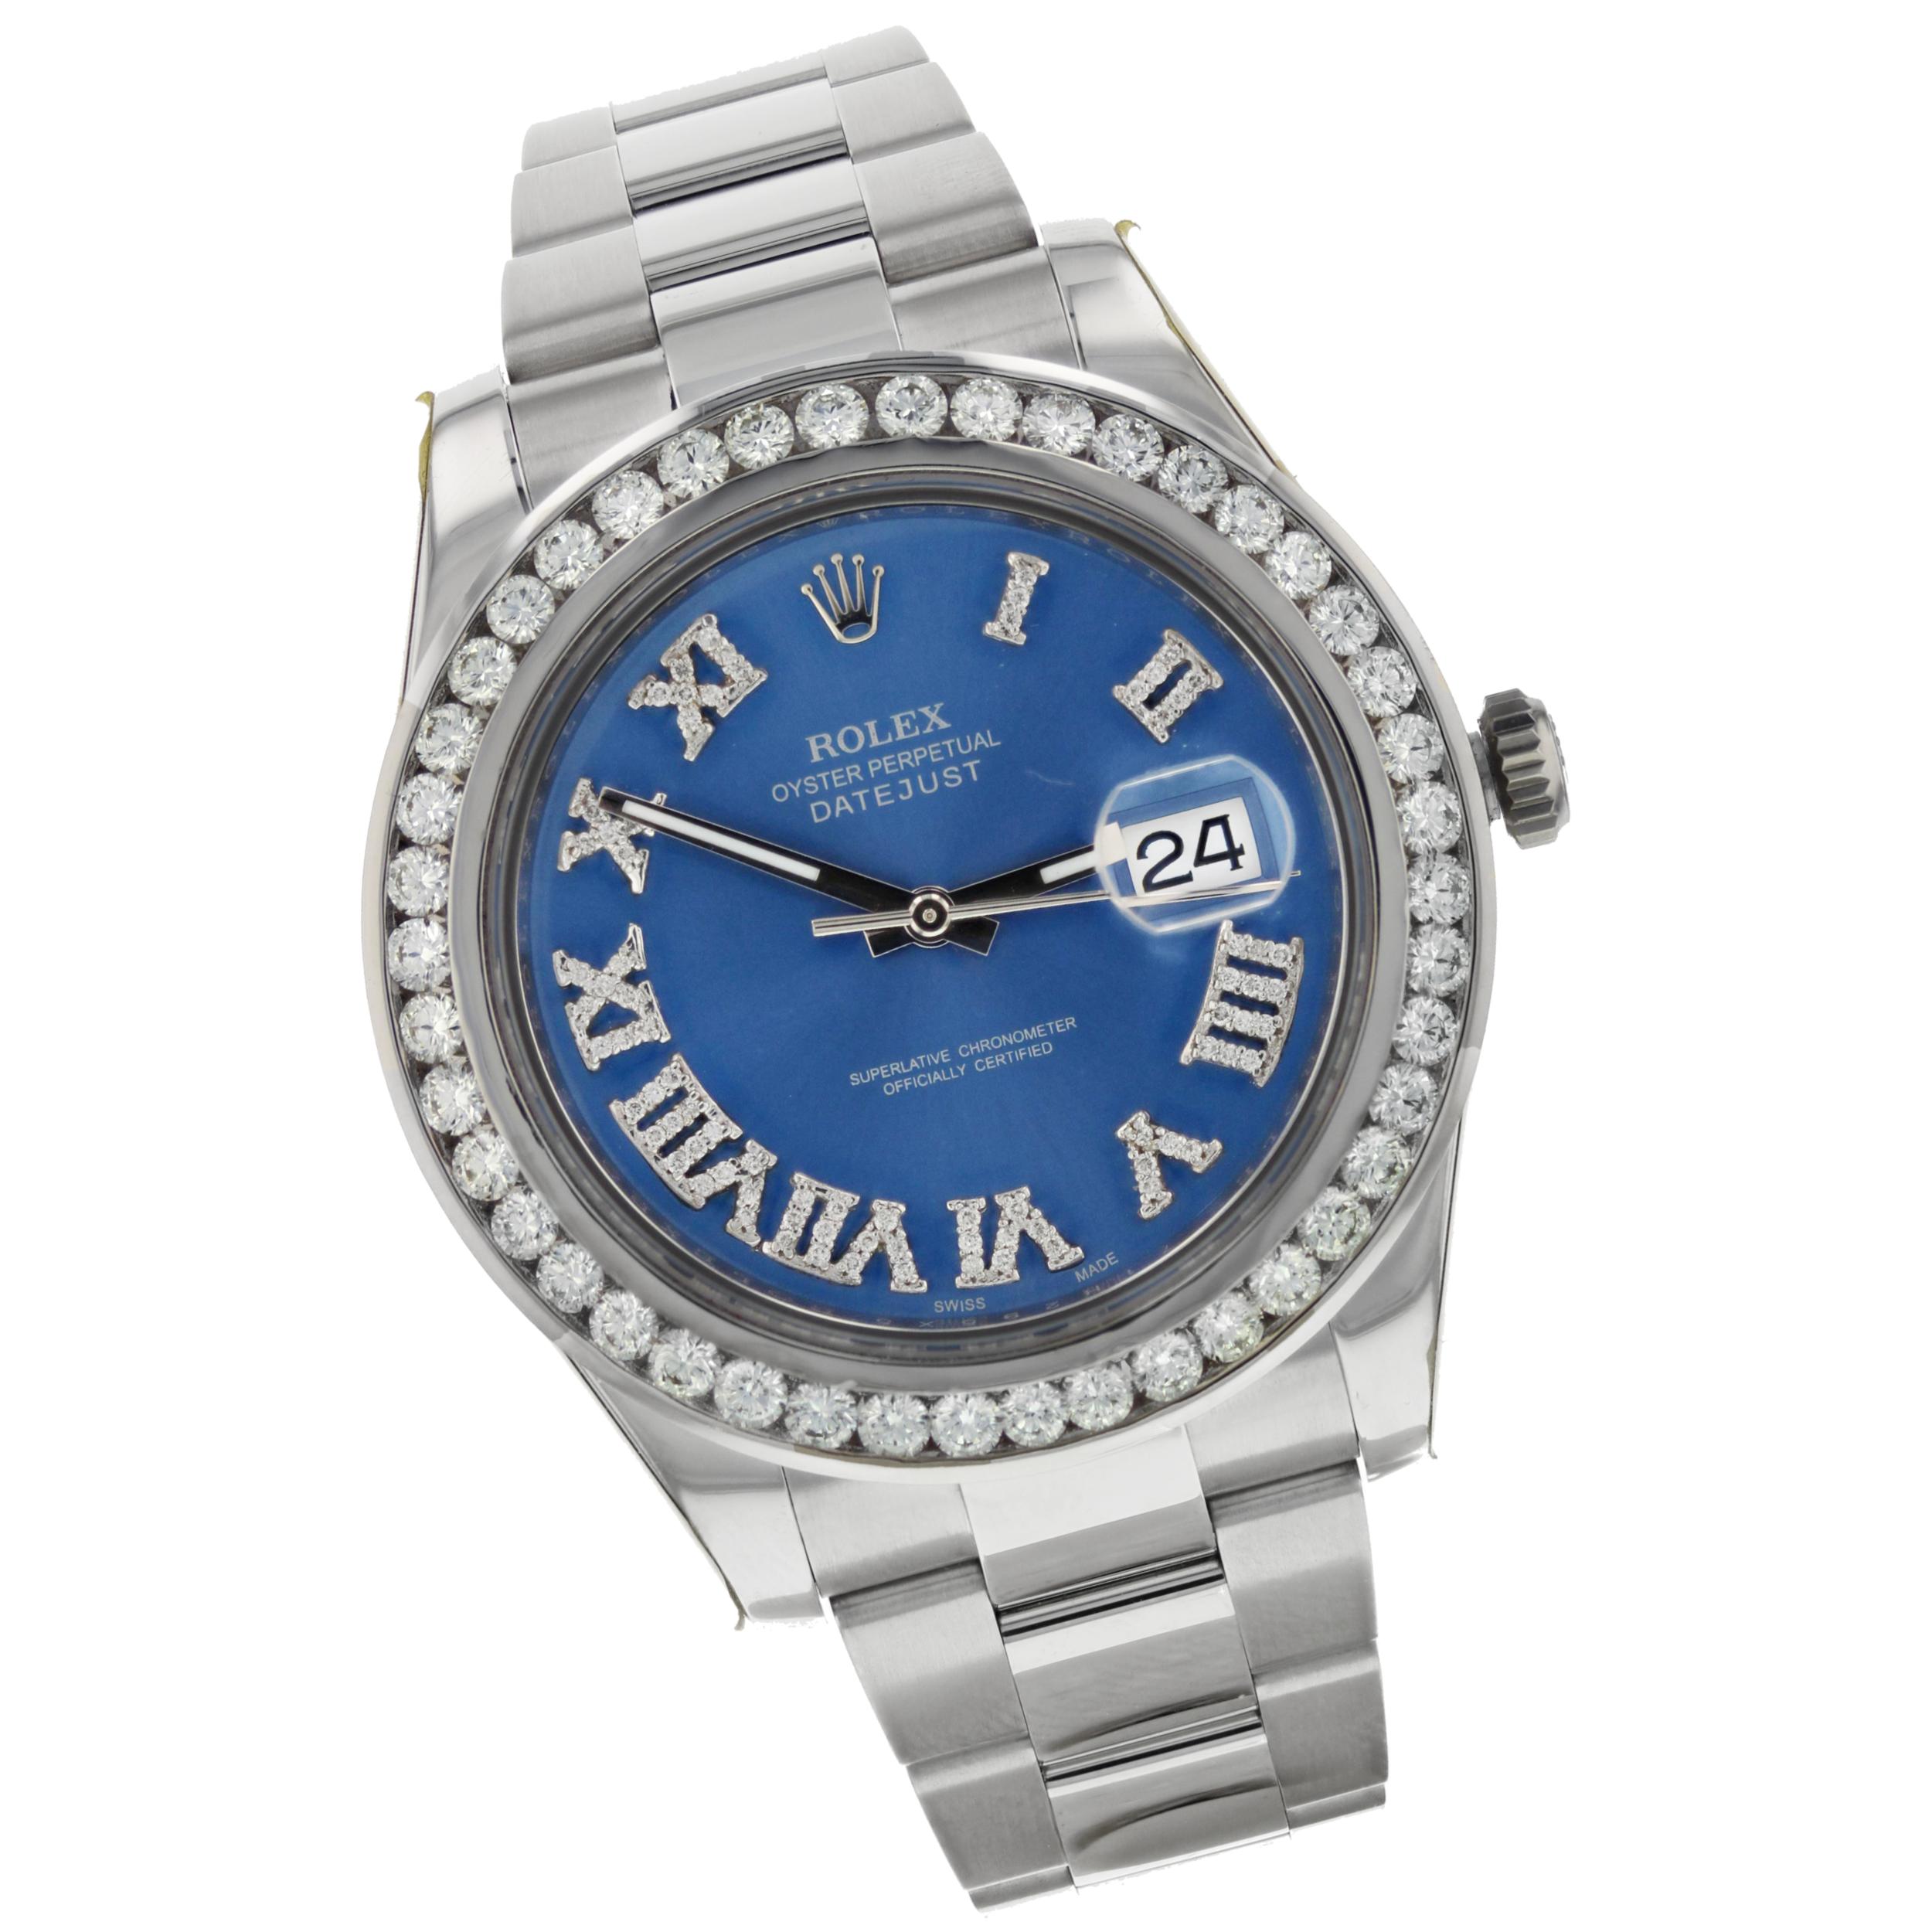 Rolex 18K White Gold/SS Datejust II